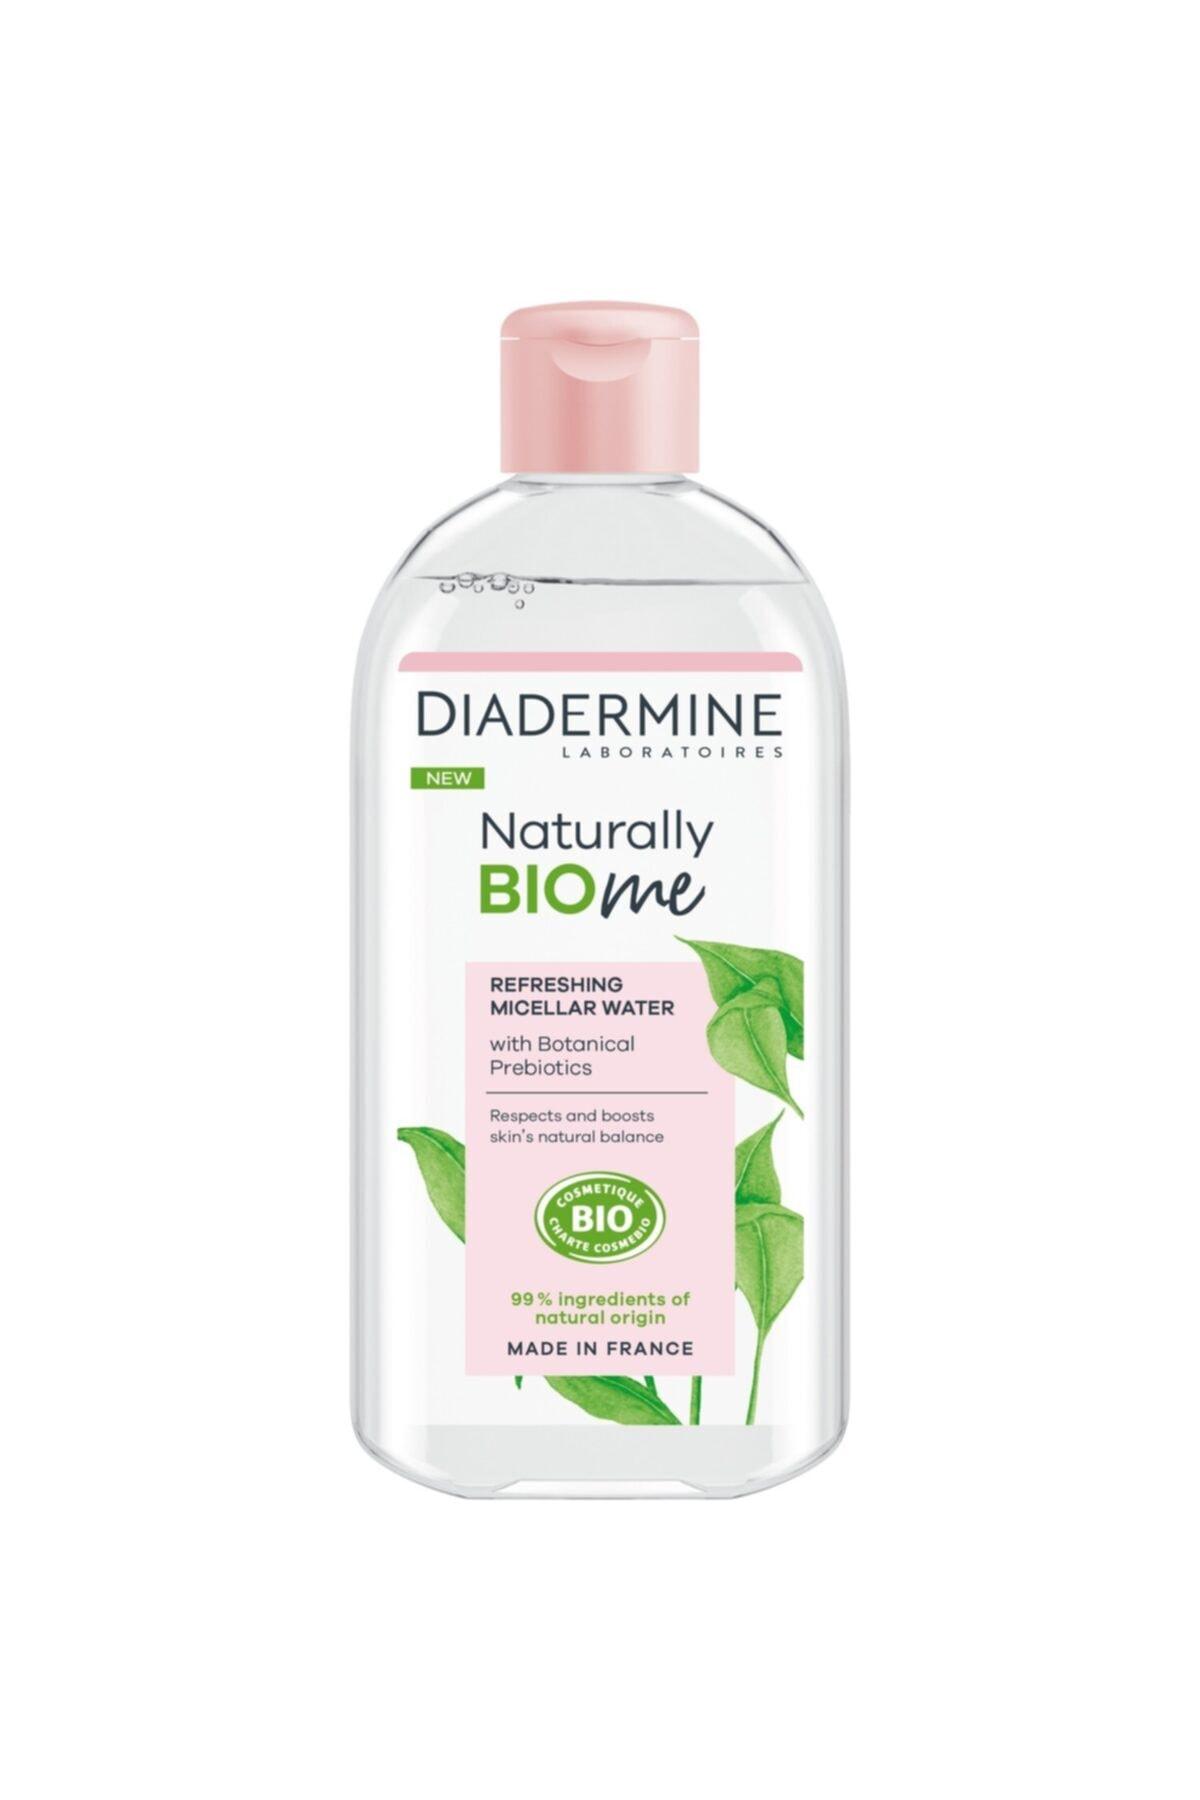 Diadermine Naturally Bio Me Canlandırıcı Micellar Makyaj Temizleme Suyu 400 ml 1